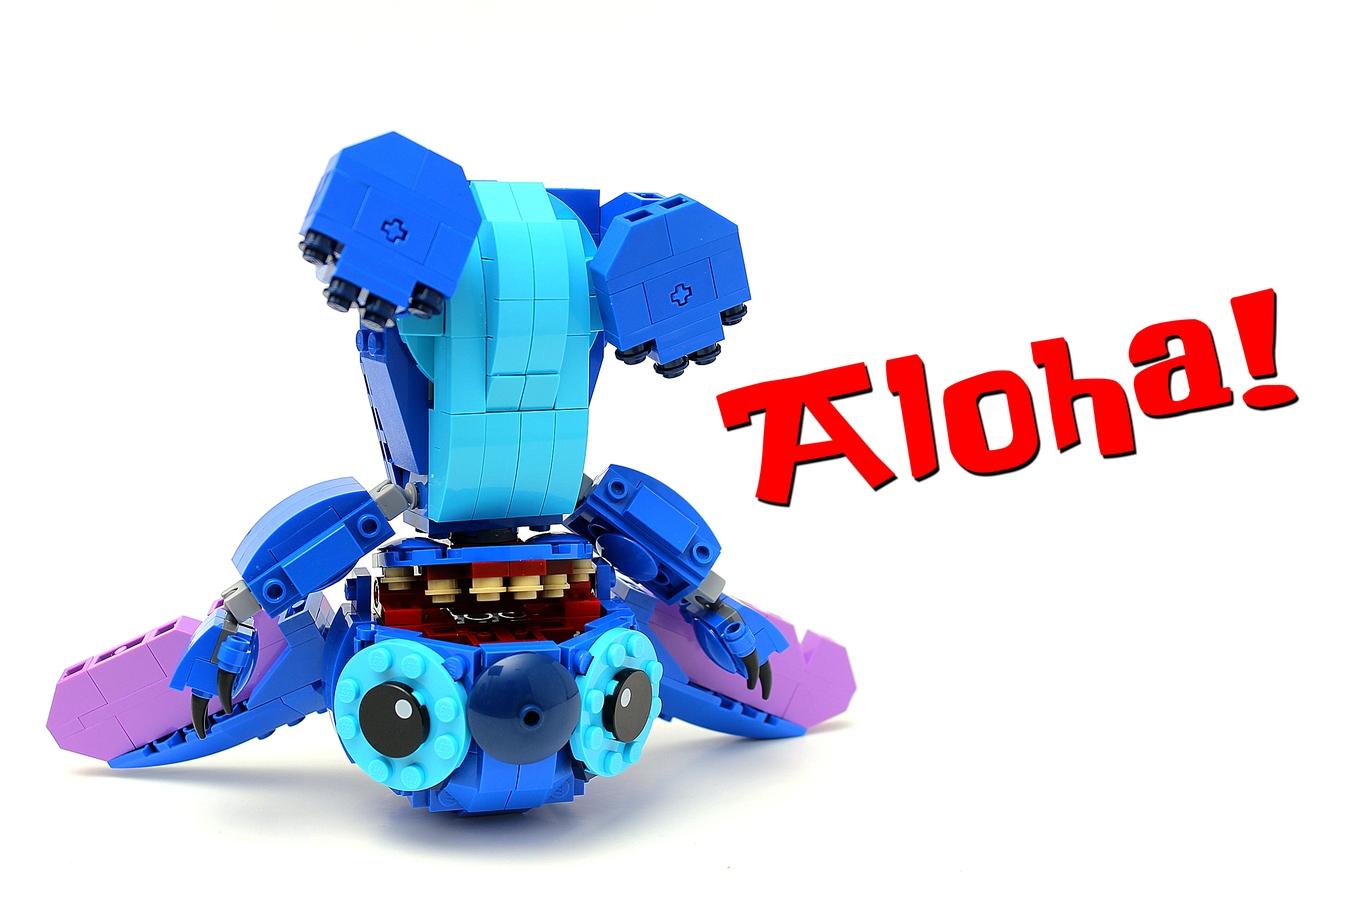 lego ideas product ideas stitch